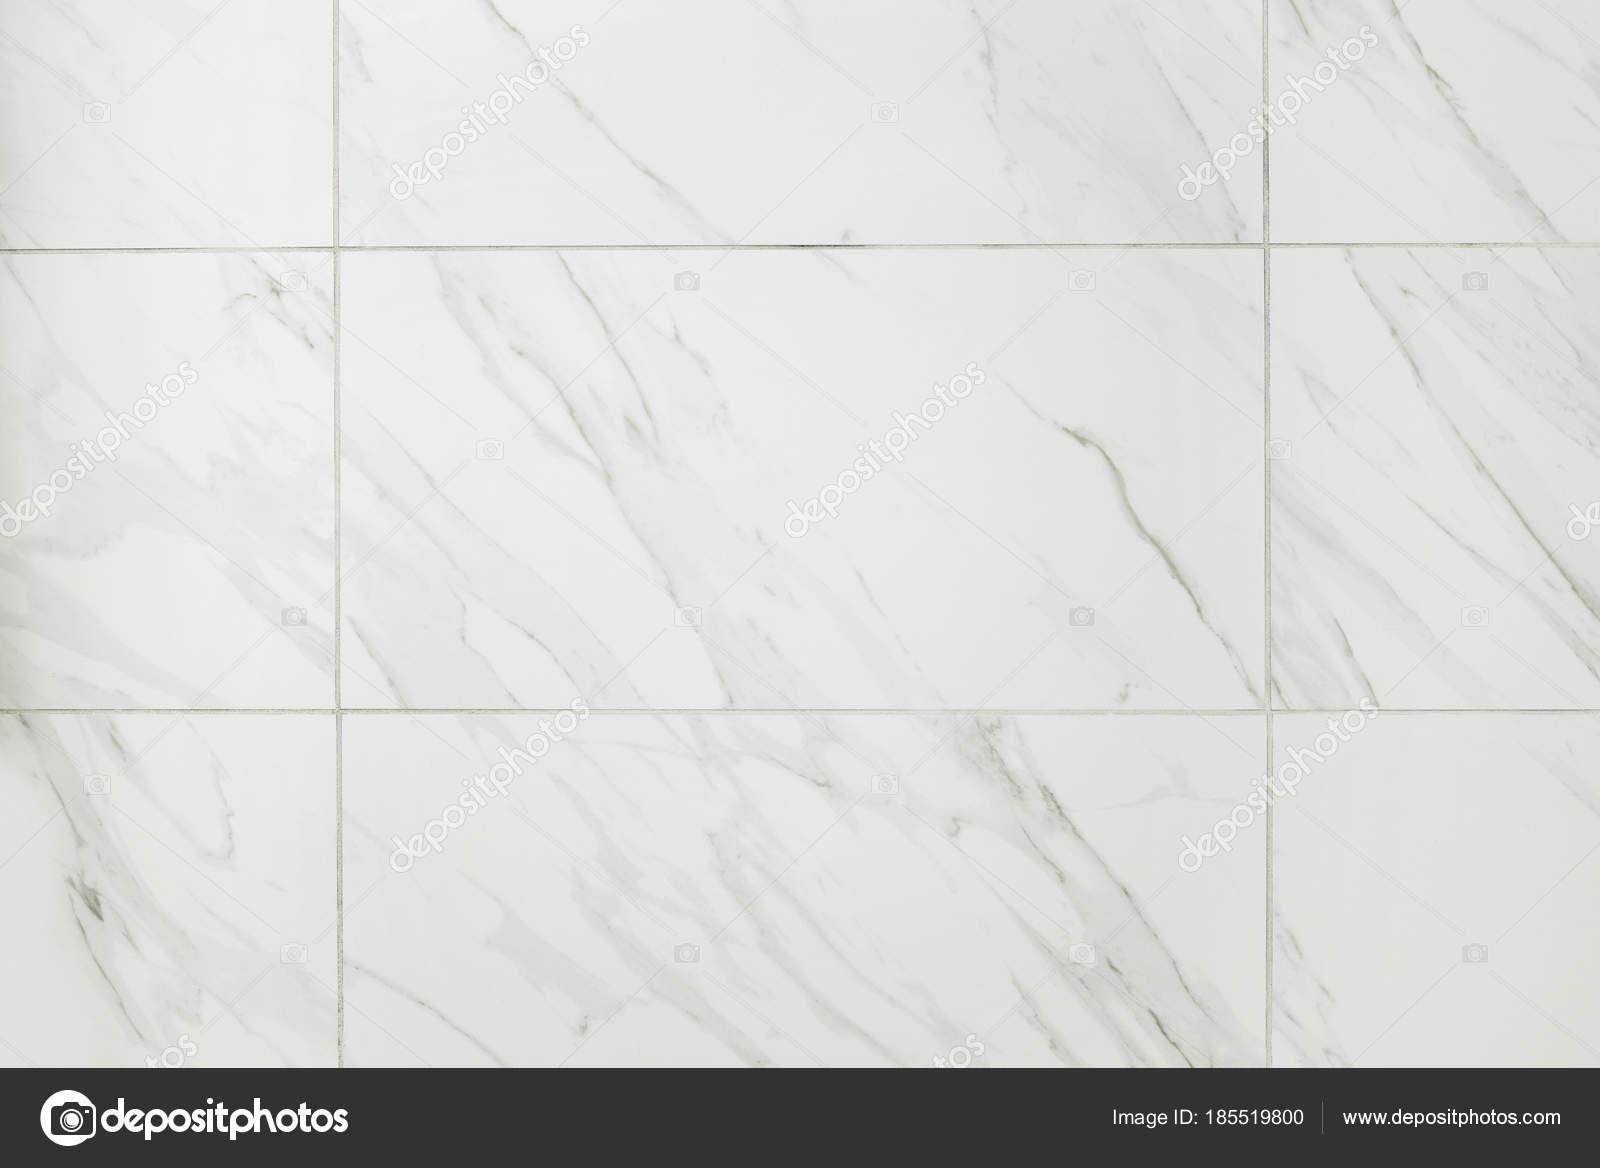 Large Marble Tile Bathroom Wall — Stock Photo © mcgphoto #185519800